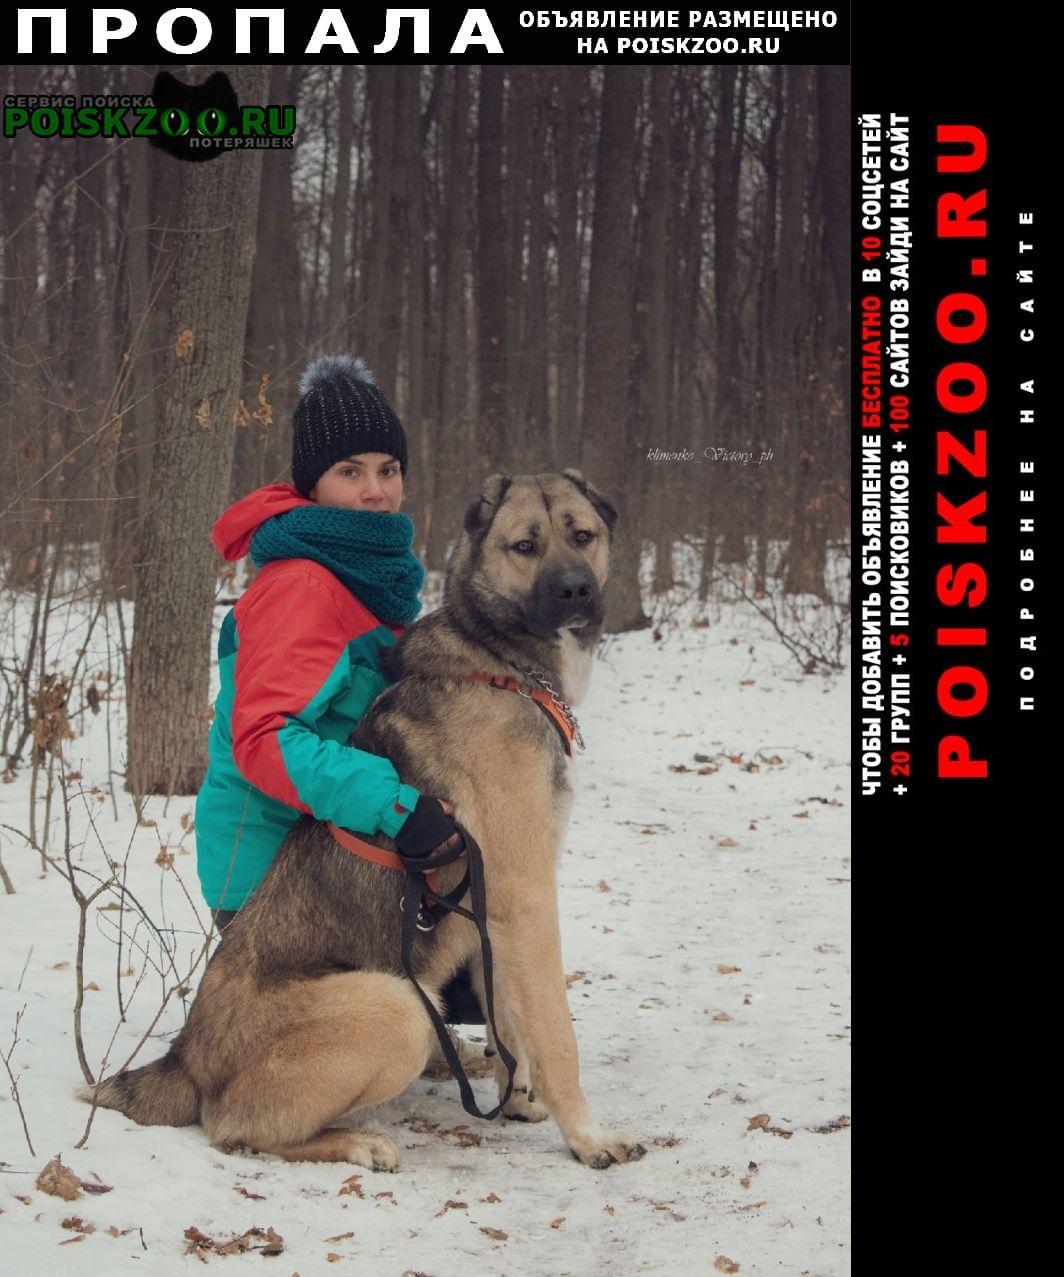 Воронеж Пропала собака украли и отдали